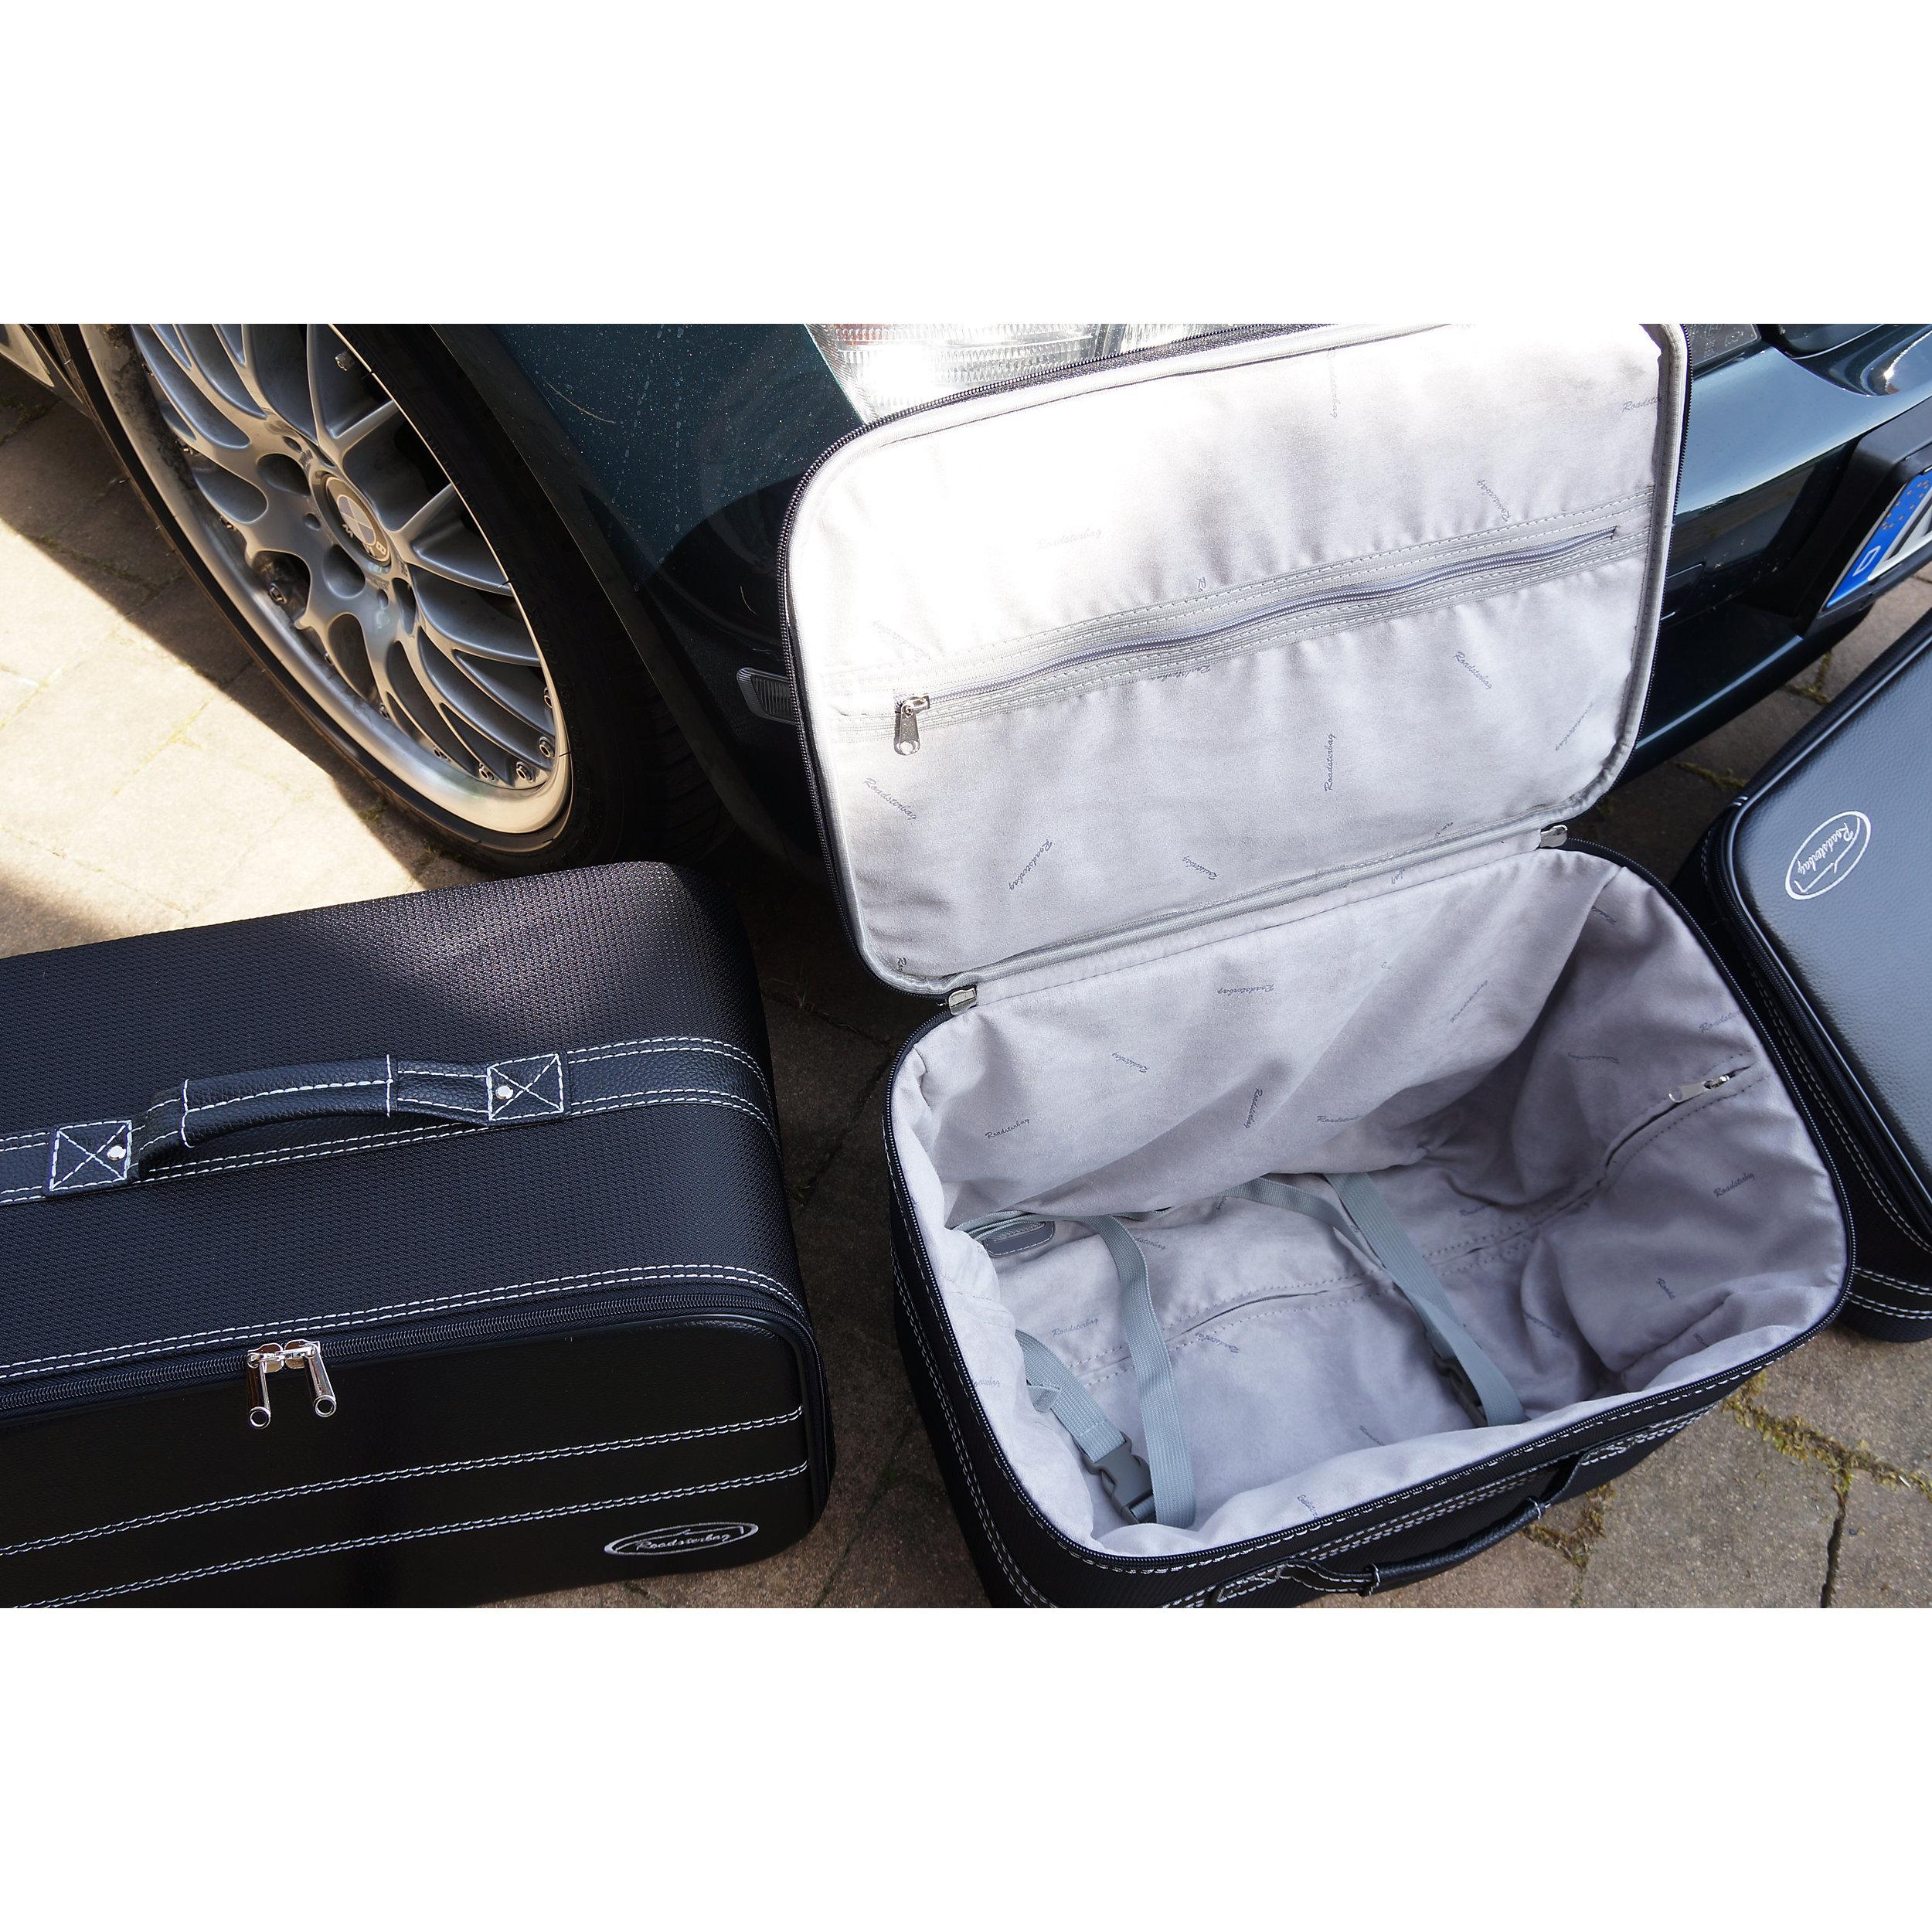 3tlg. Autokoffer-Set BMW Z3 119 Liter